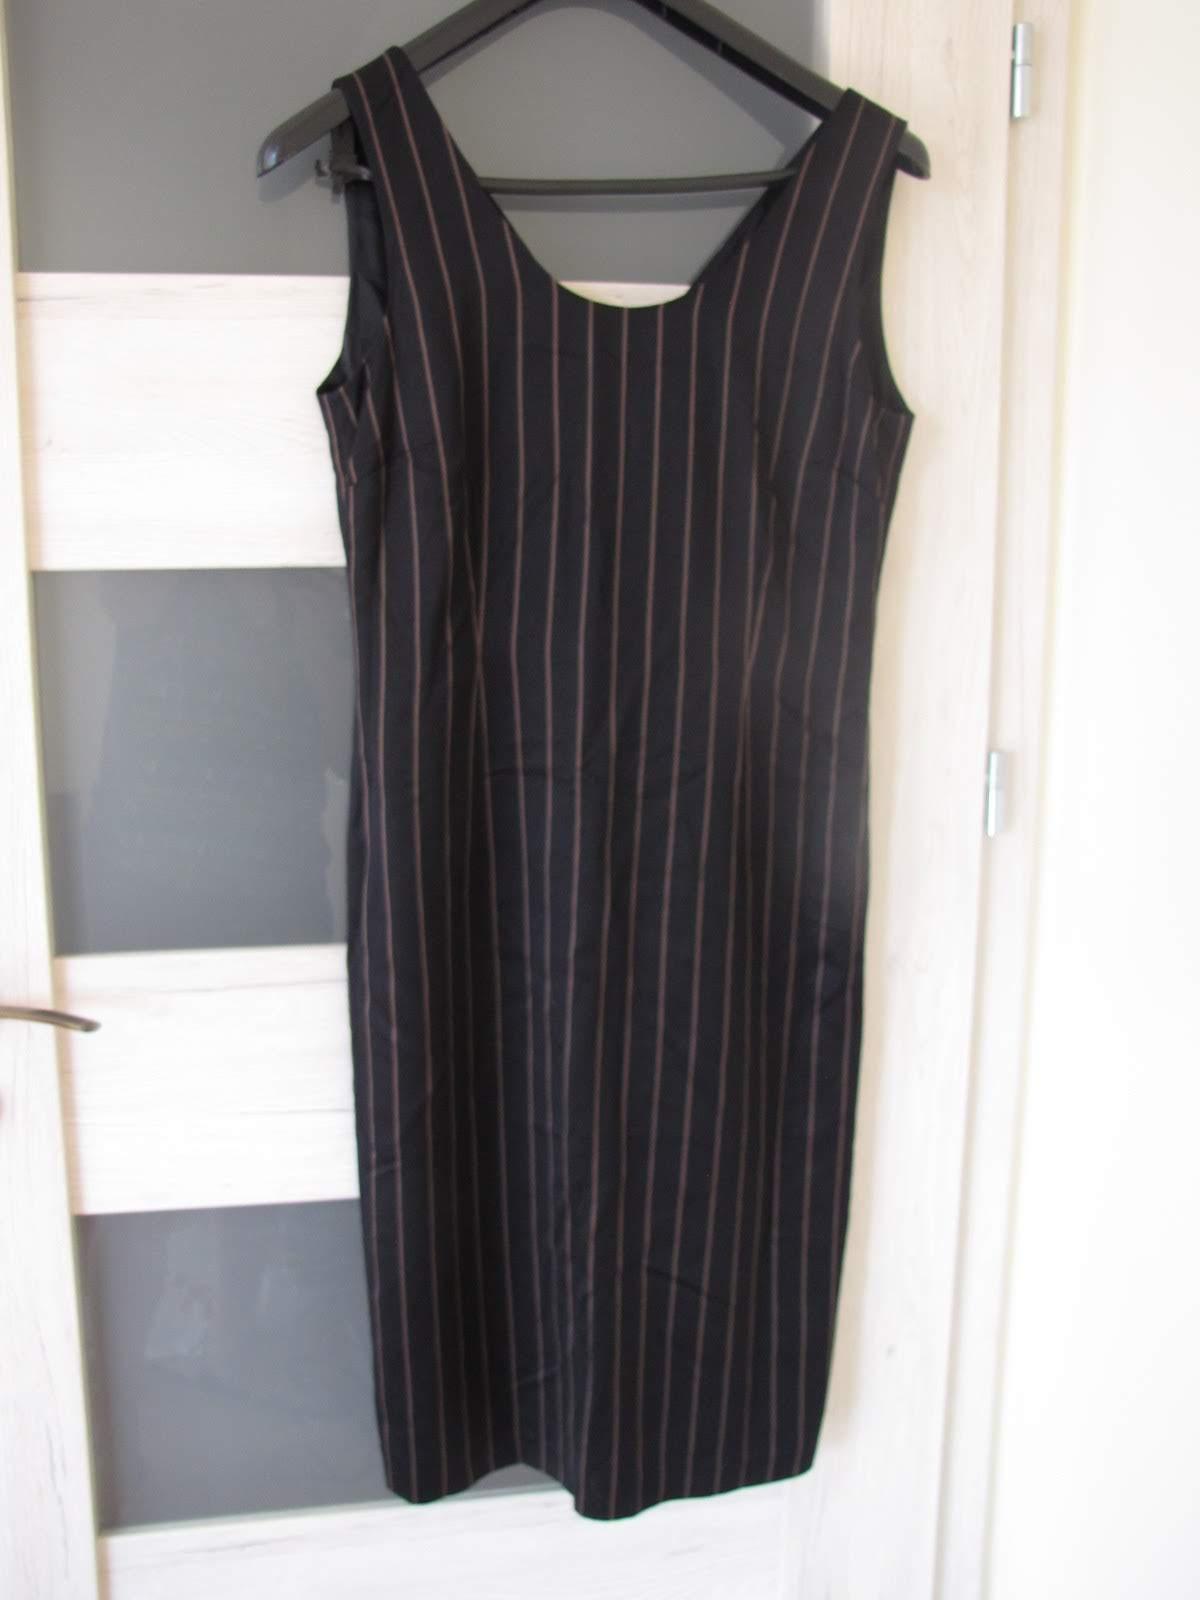 a046e5b658 Sukienka Monnari rozmiar m l - 7558281852 - oficjalne archiwum allegro